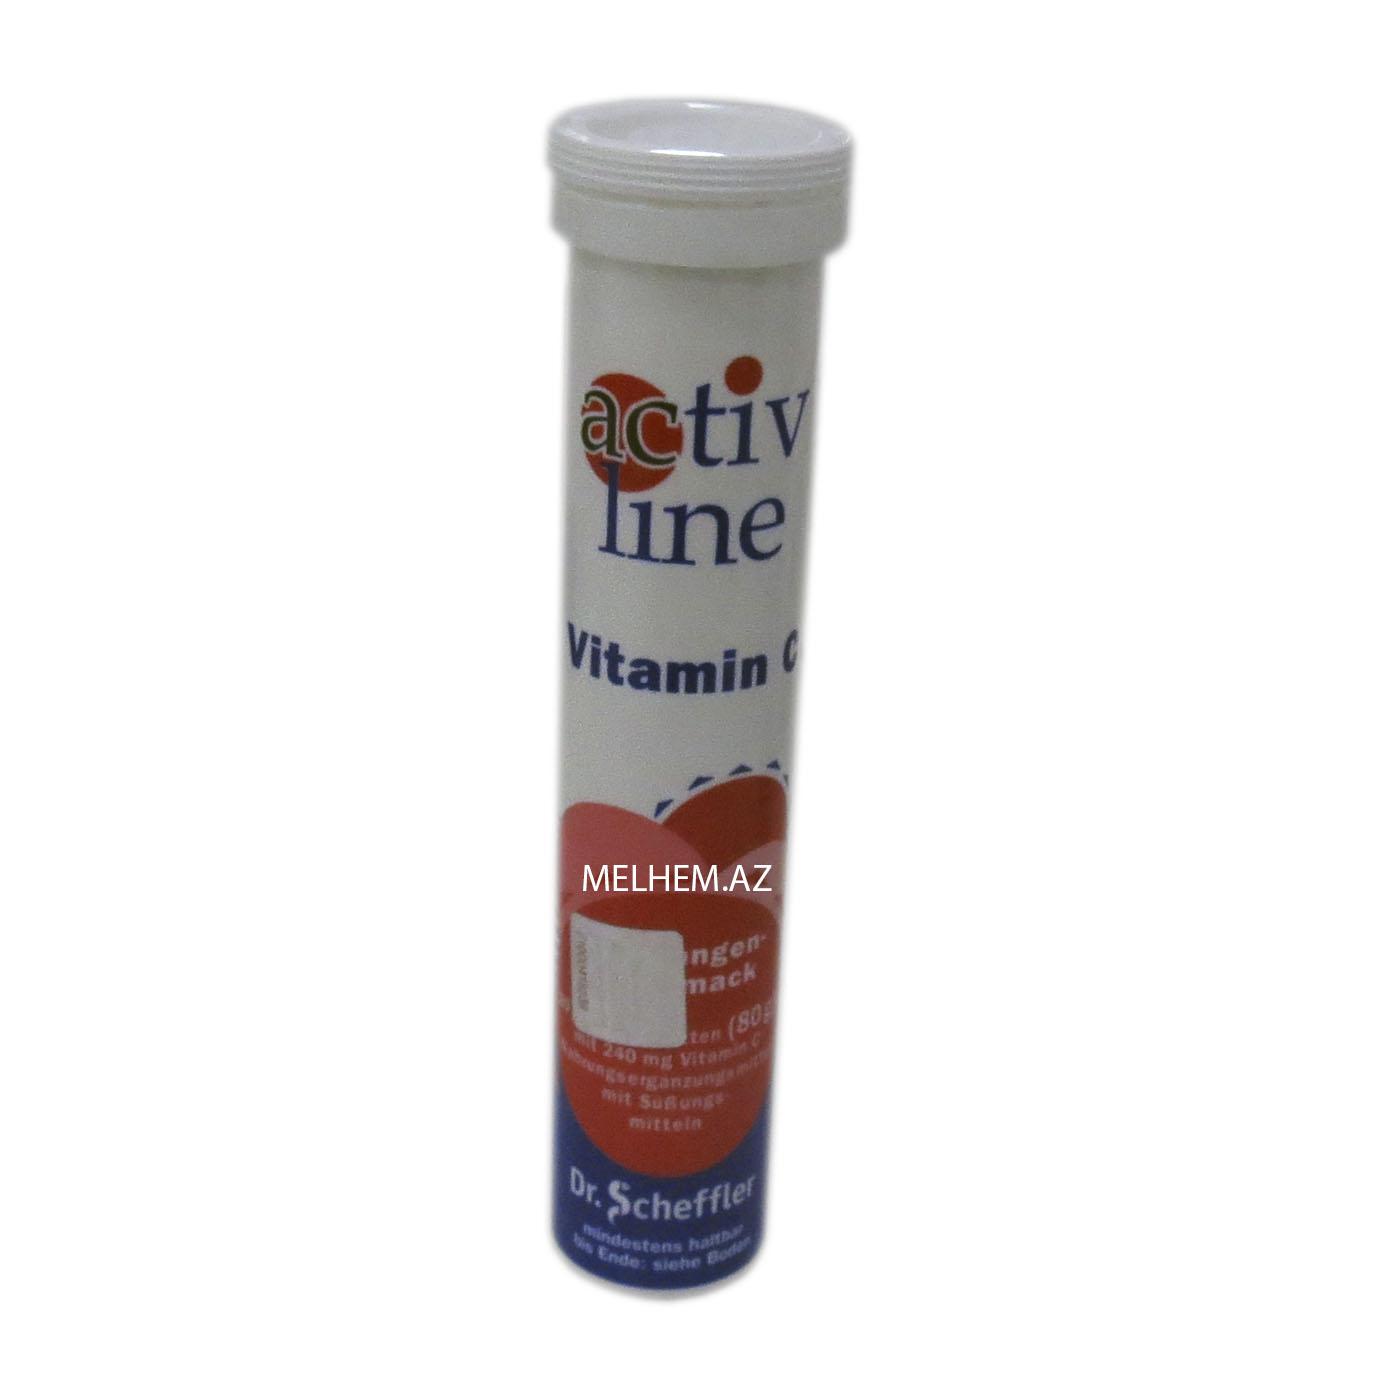 ACTIVE LINE ( VITAMIN C )